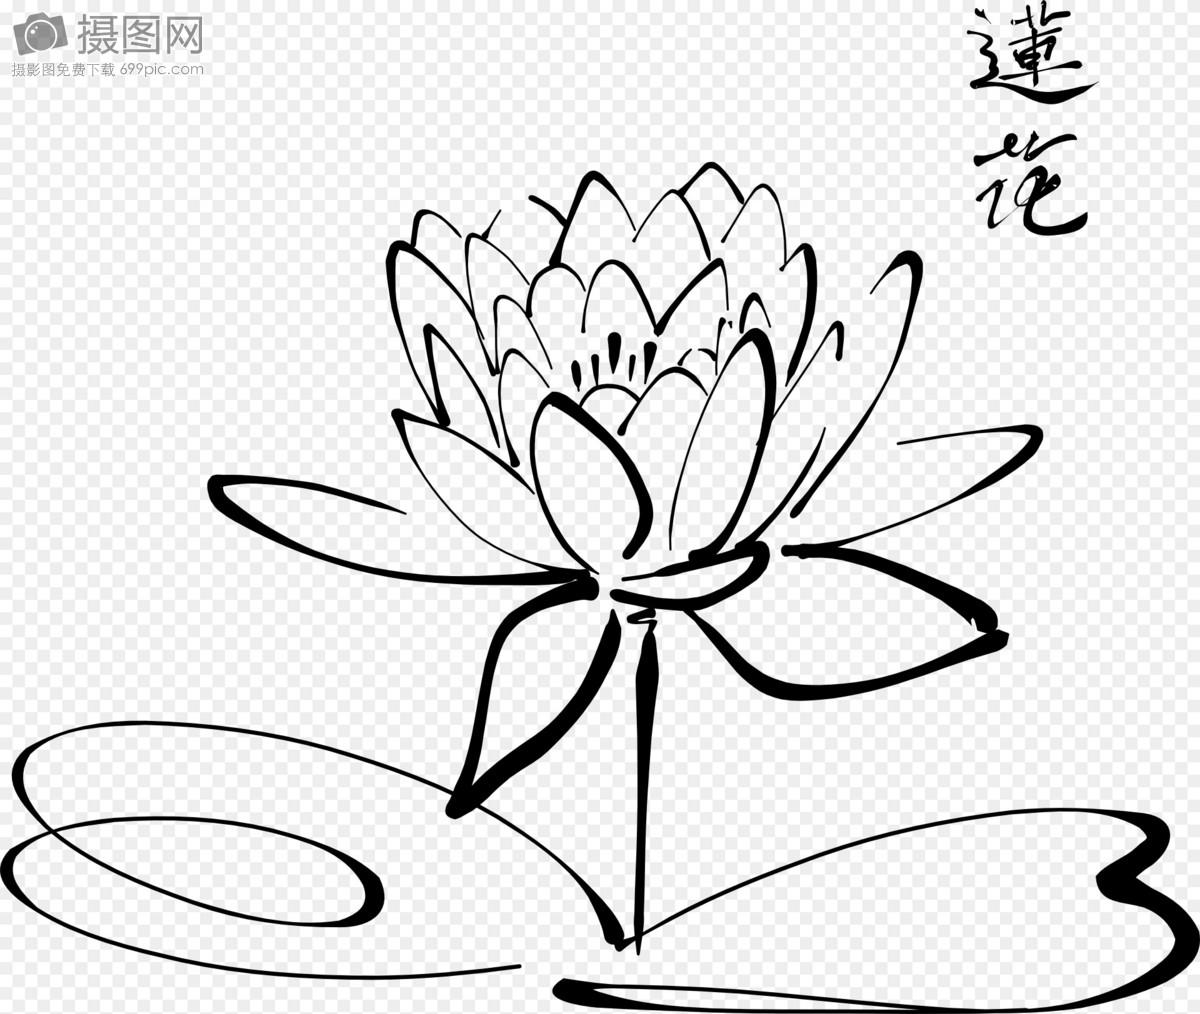 D Line Drawings Logo : 黑色简笔莲花图片素材 免费下载 svg图片格式 高清图片 摄图网